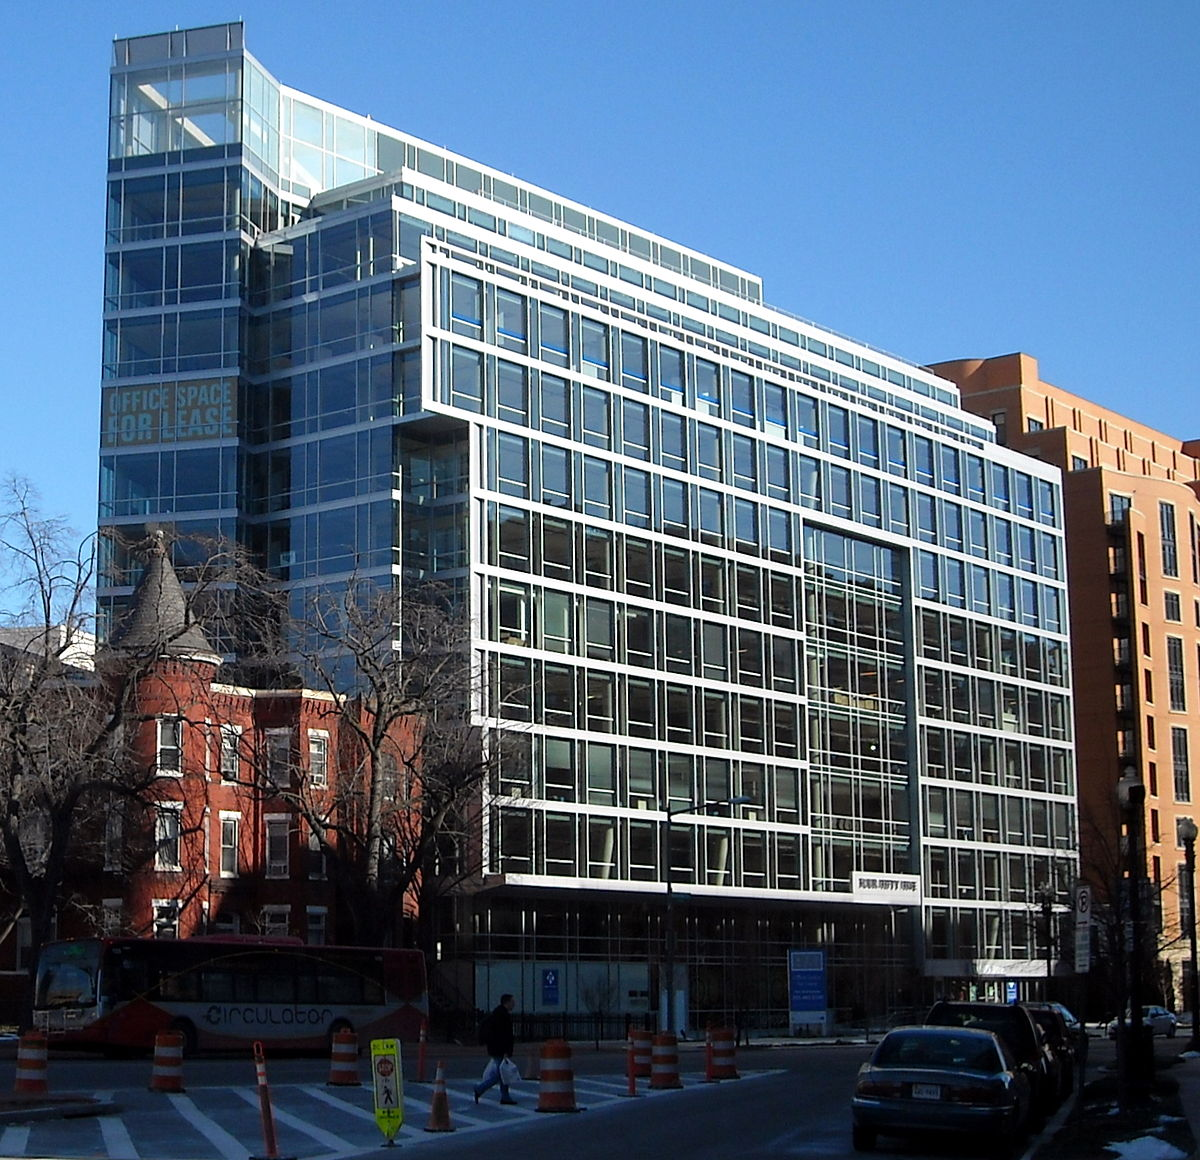 455 Massachusetts Avenue Wikipedia